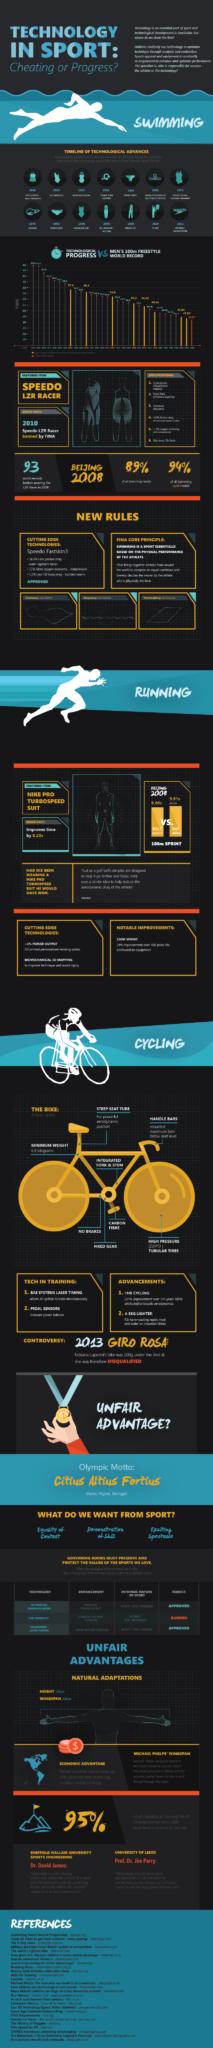 SwimShop_BuiltVisible_Infographic_V6